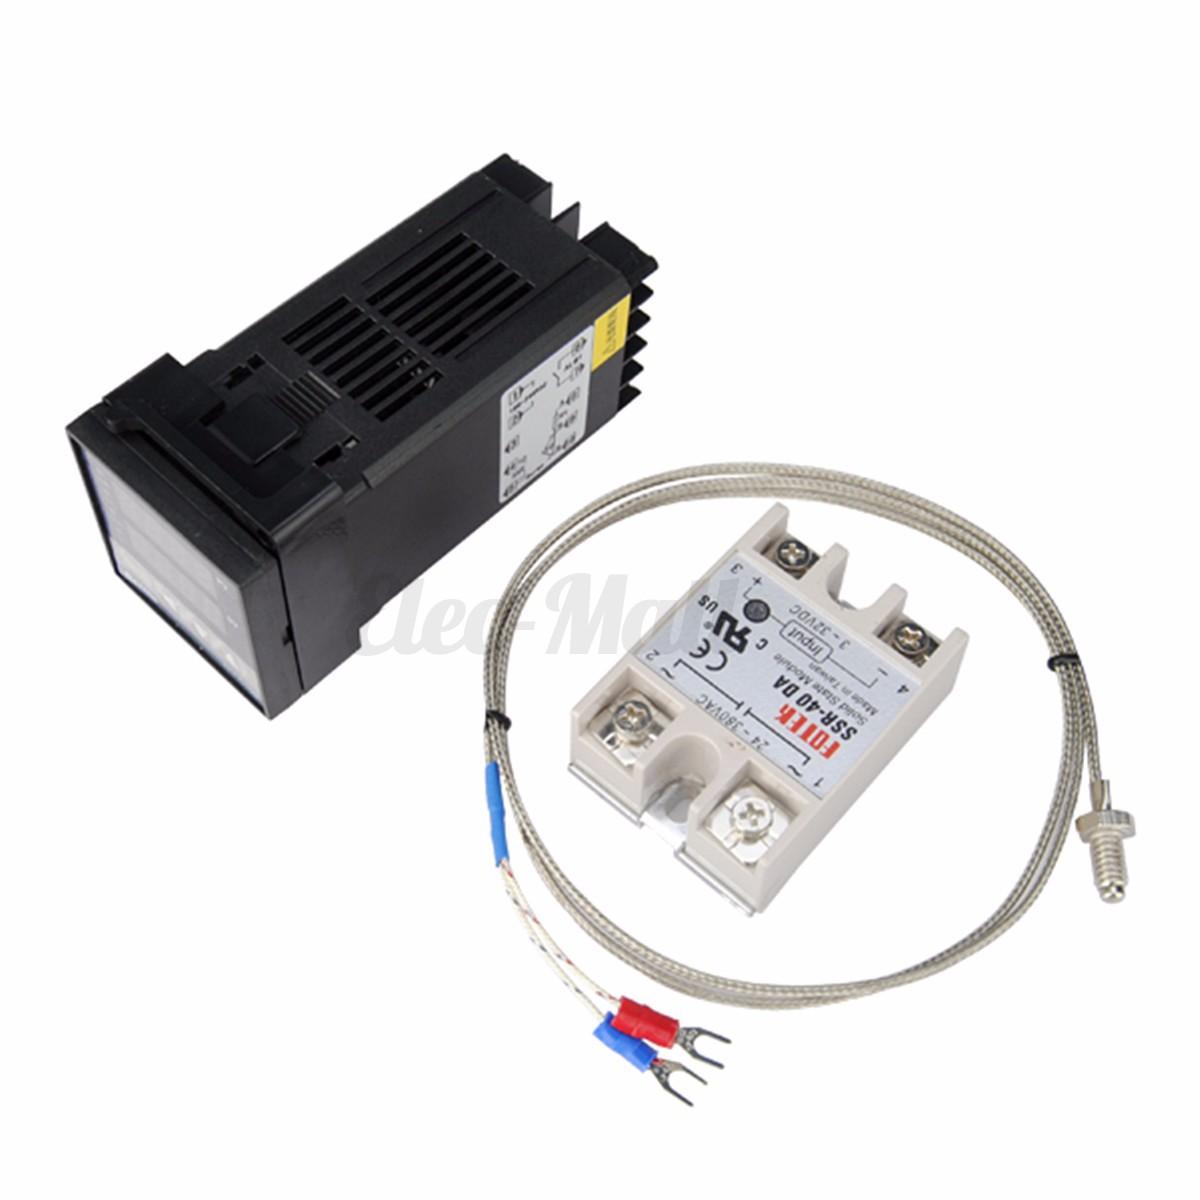 220V PID REX C100 Temperature Controller   max.40A SSR K Thermocouple #2257A9